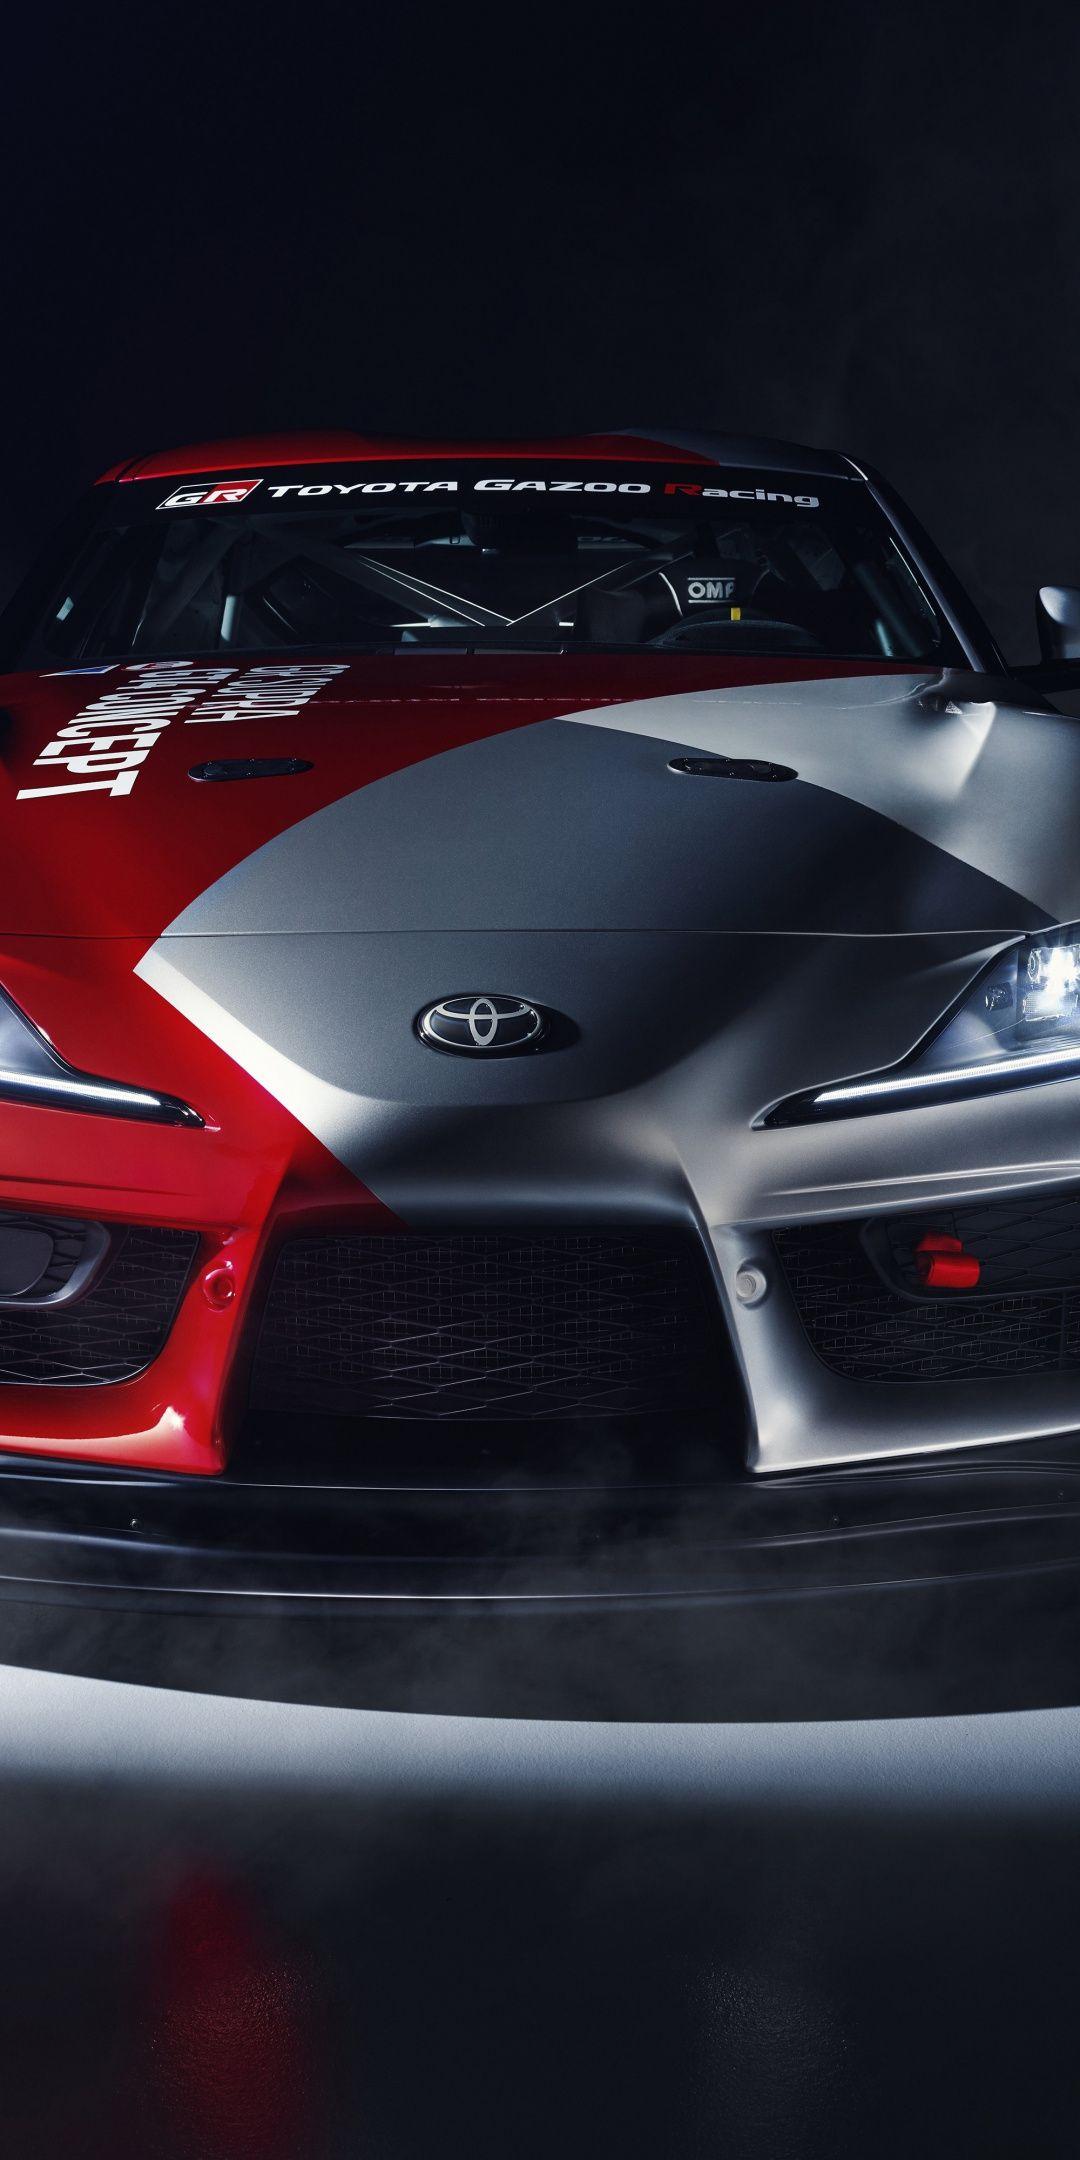 Toyota Gr Supra Gt4 Concept Car 2019 1080x2160 Wallpaper Concept Cars Toyota Supra